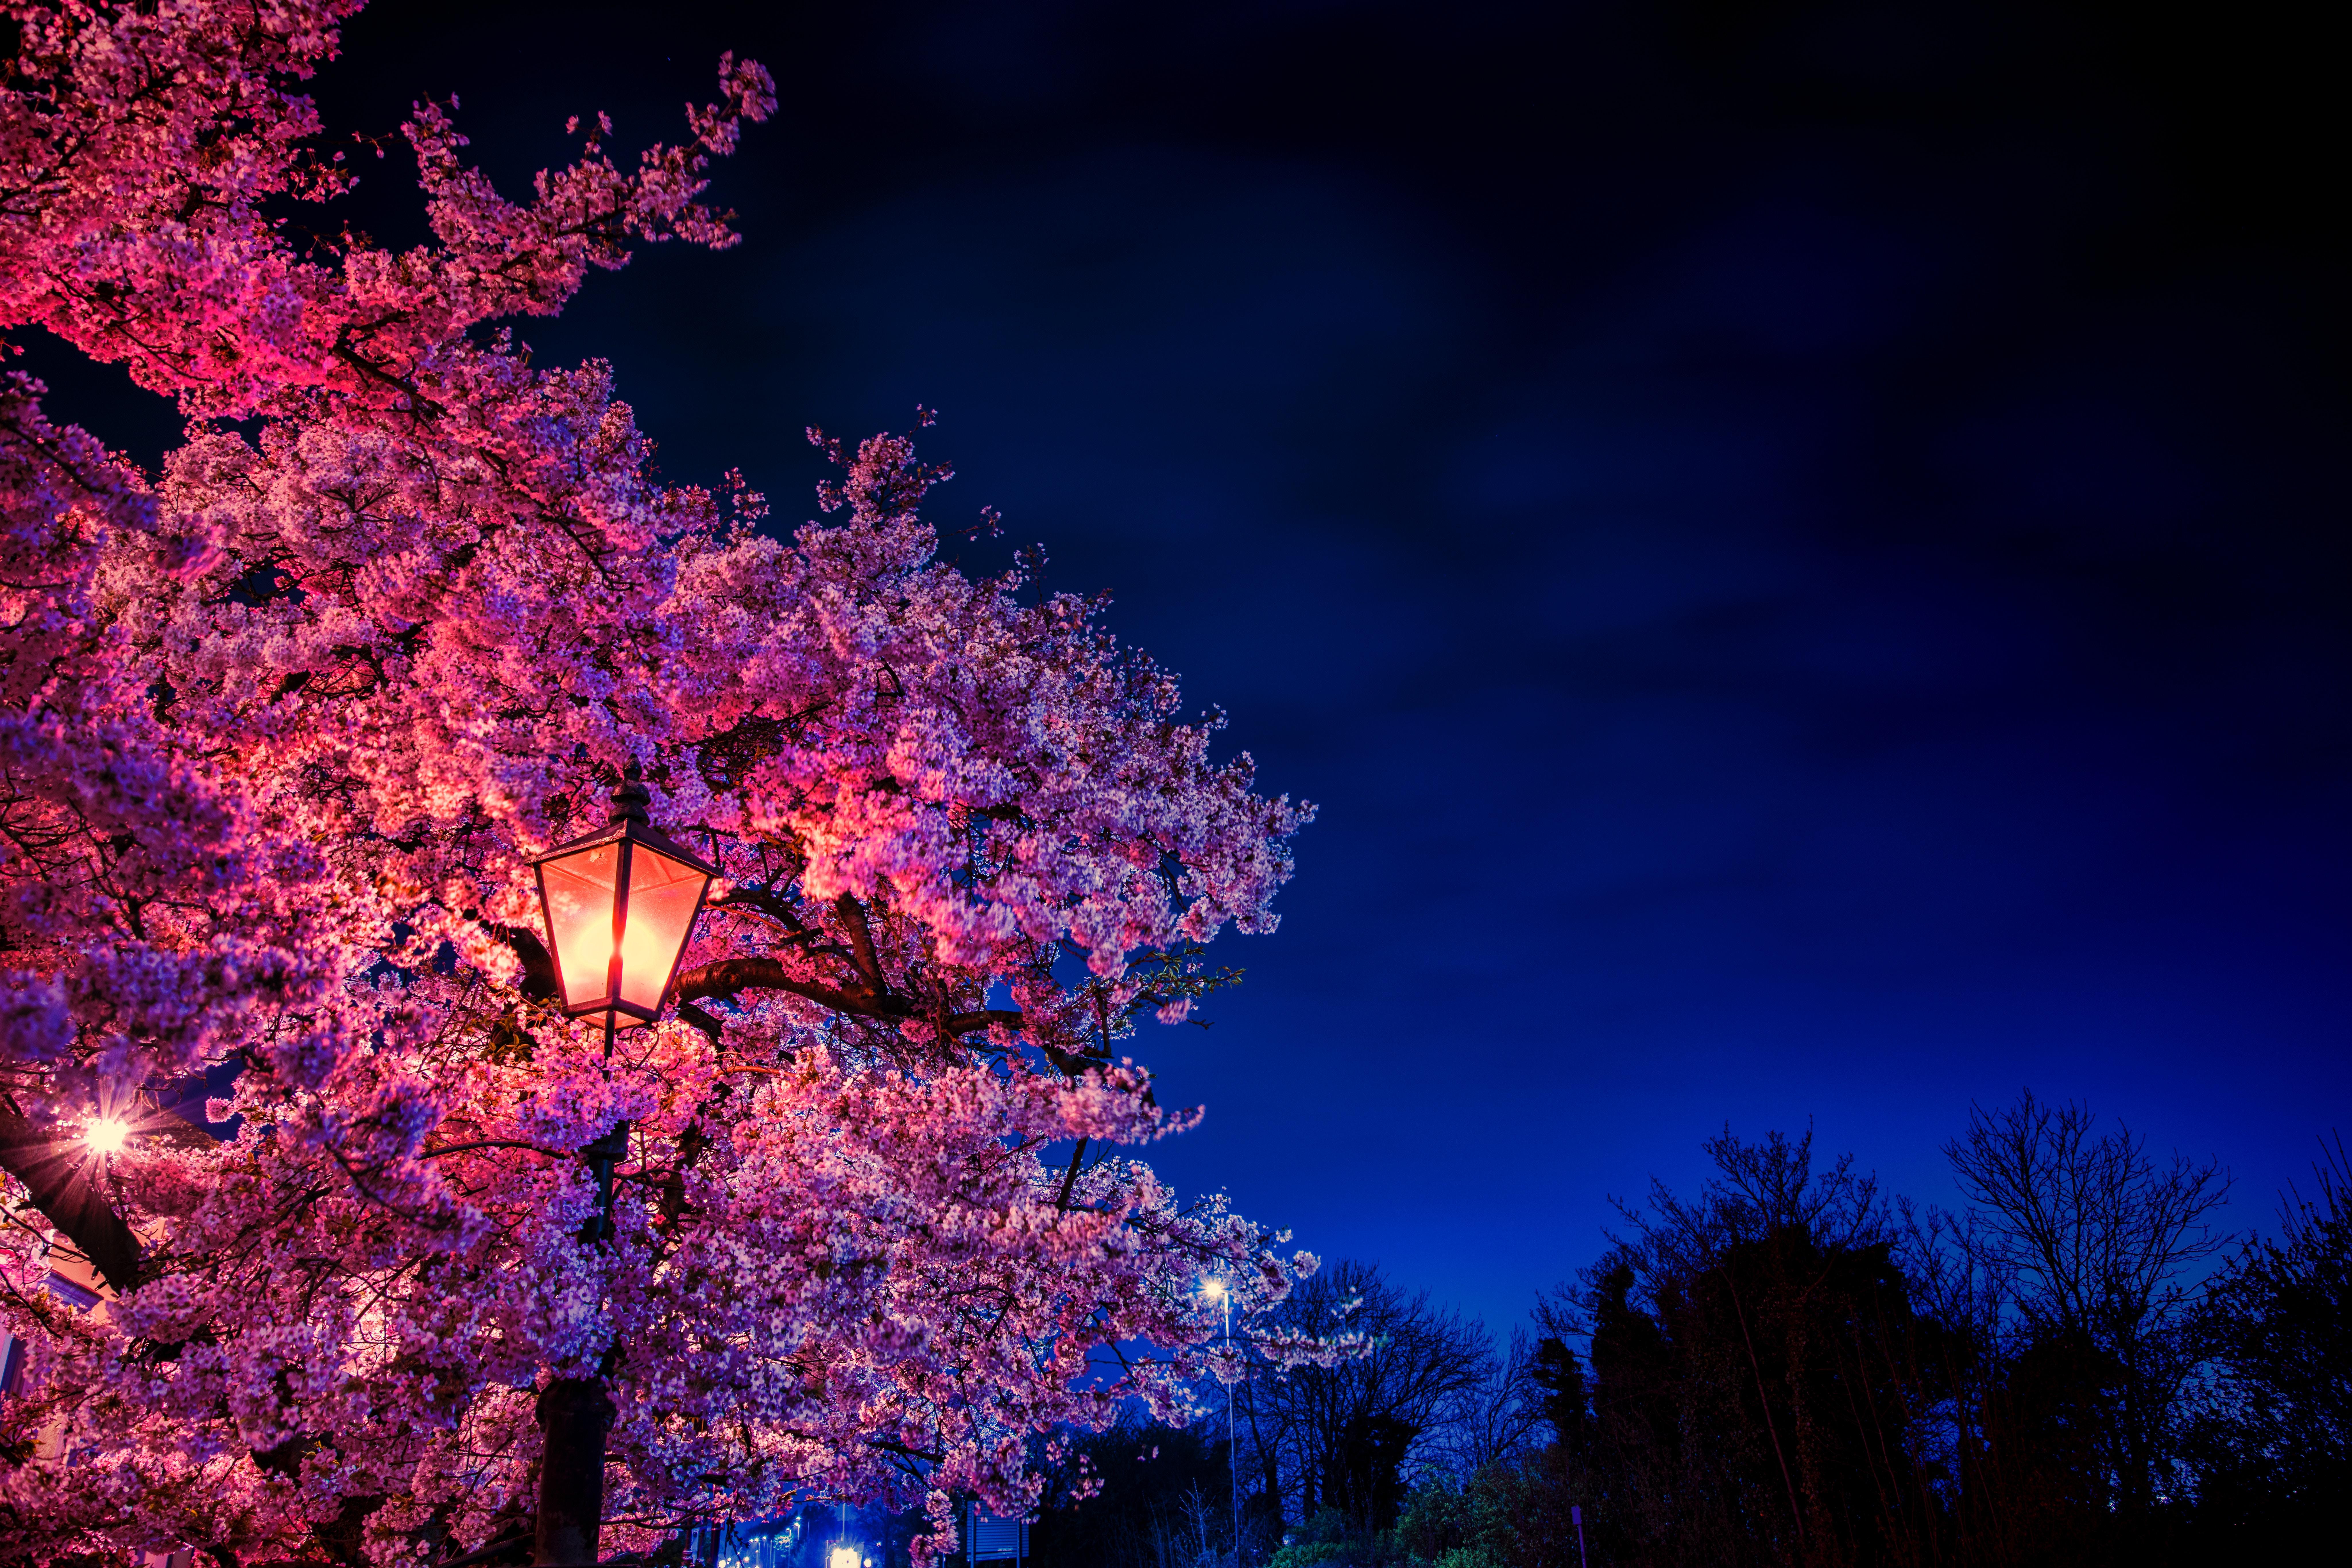 155481 Screensavers and Wallpapers Sakura for phone. Download Flowers, Sakura, Lamp, Lantern, Evening, Spring, Blooms pictures for free